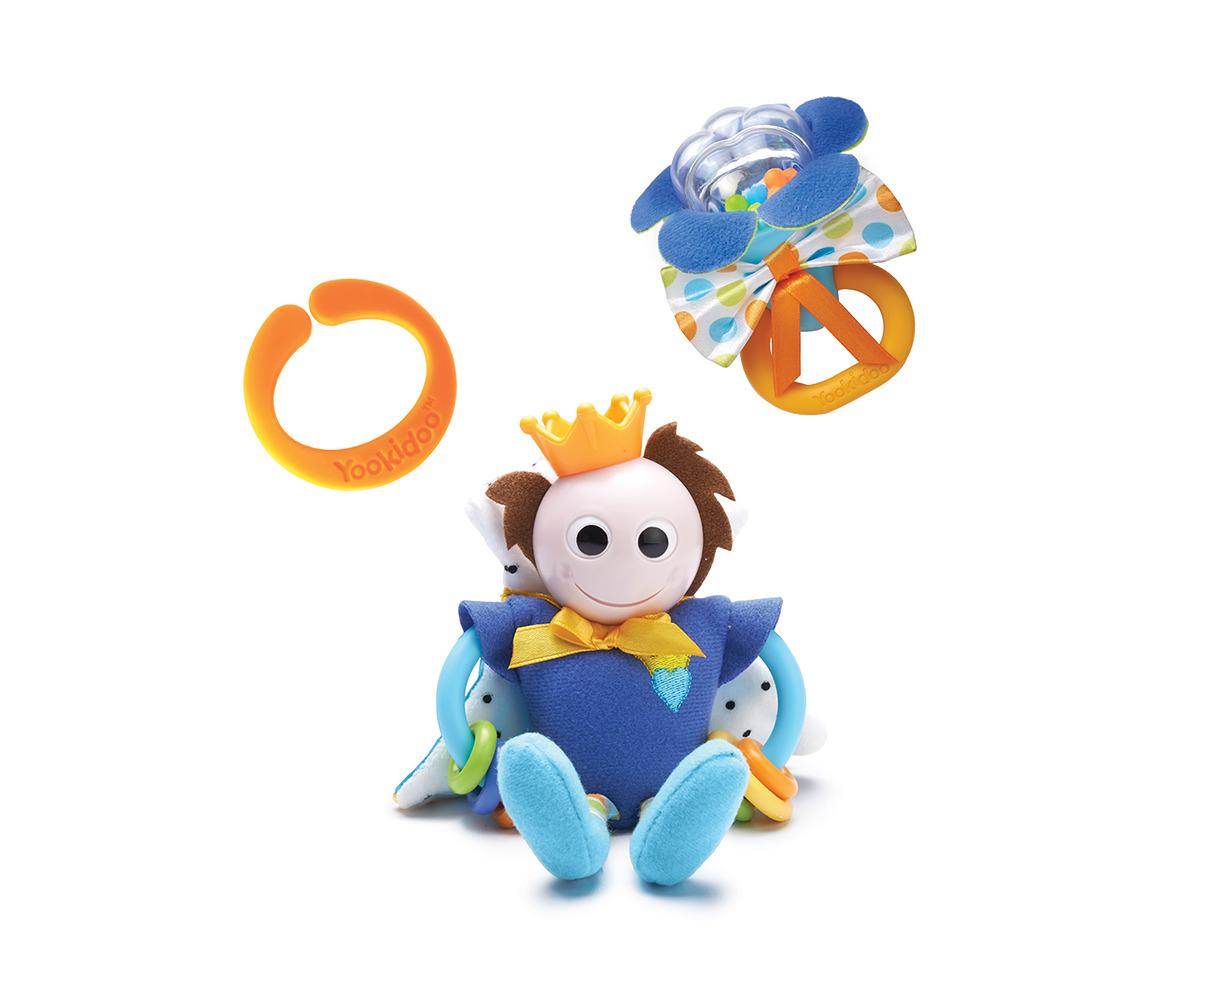 Yookidoo Baby Rattles Activity Toy Teether Prince Play Set